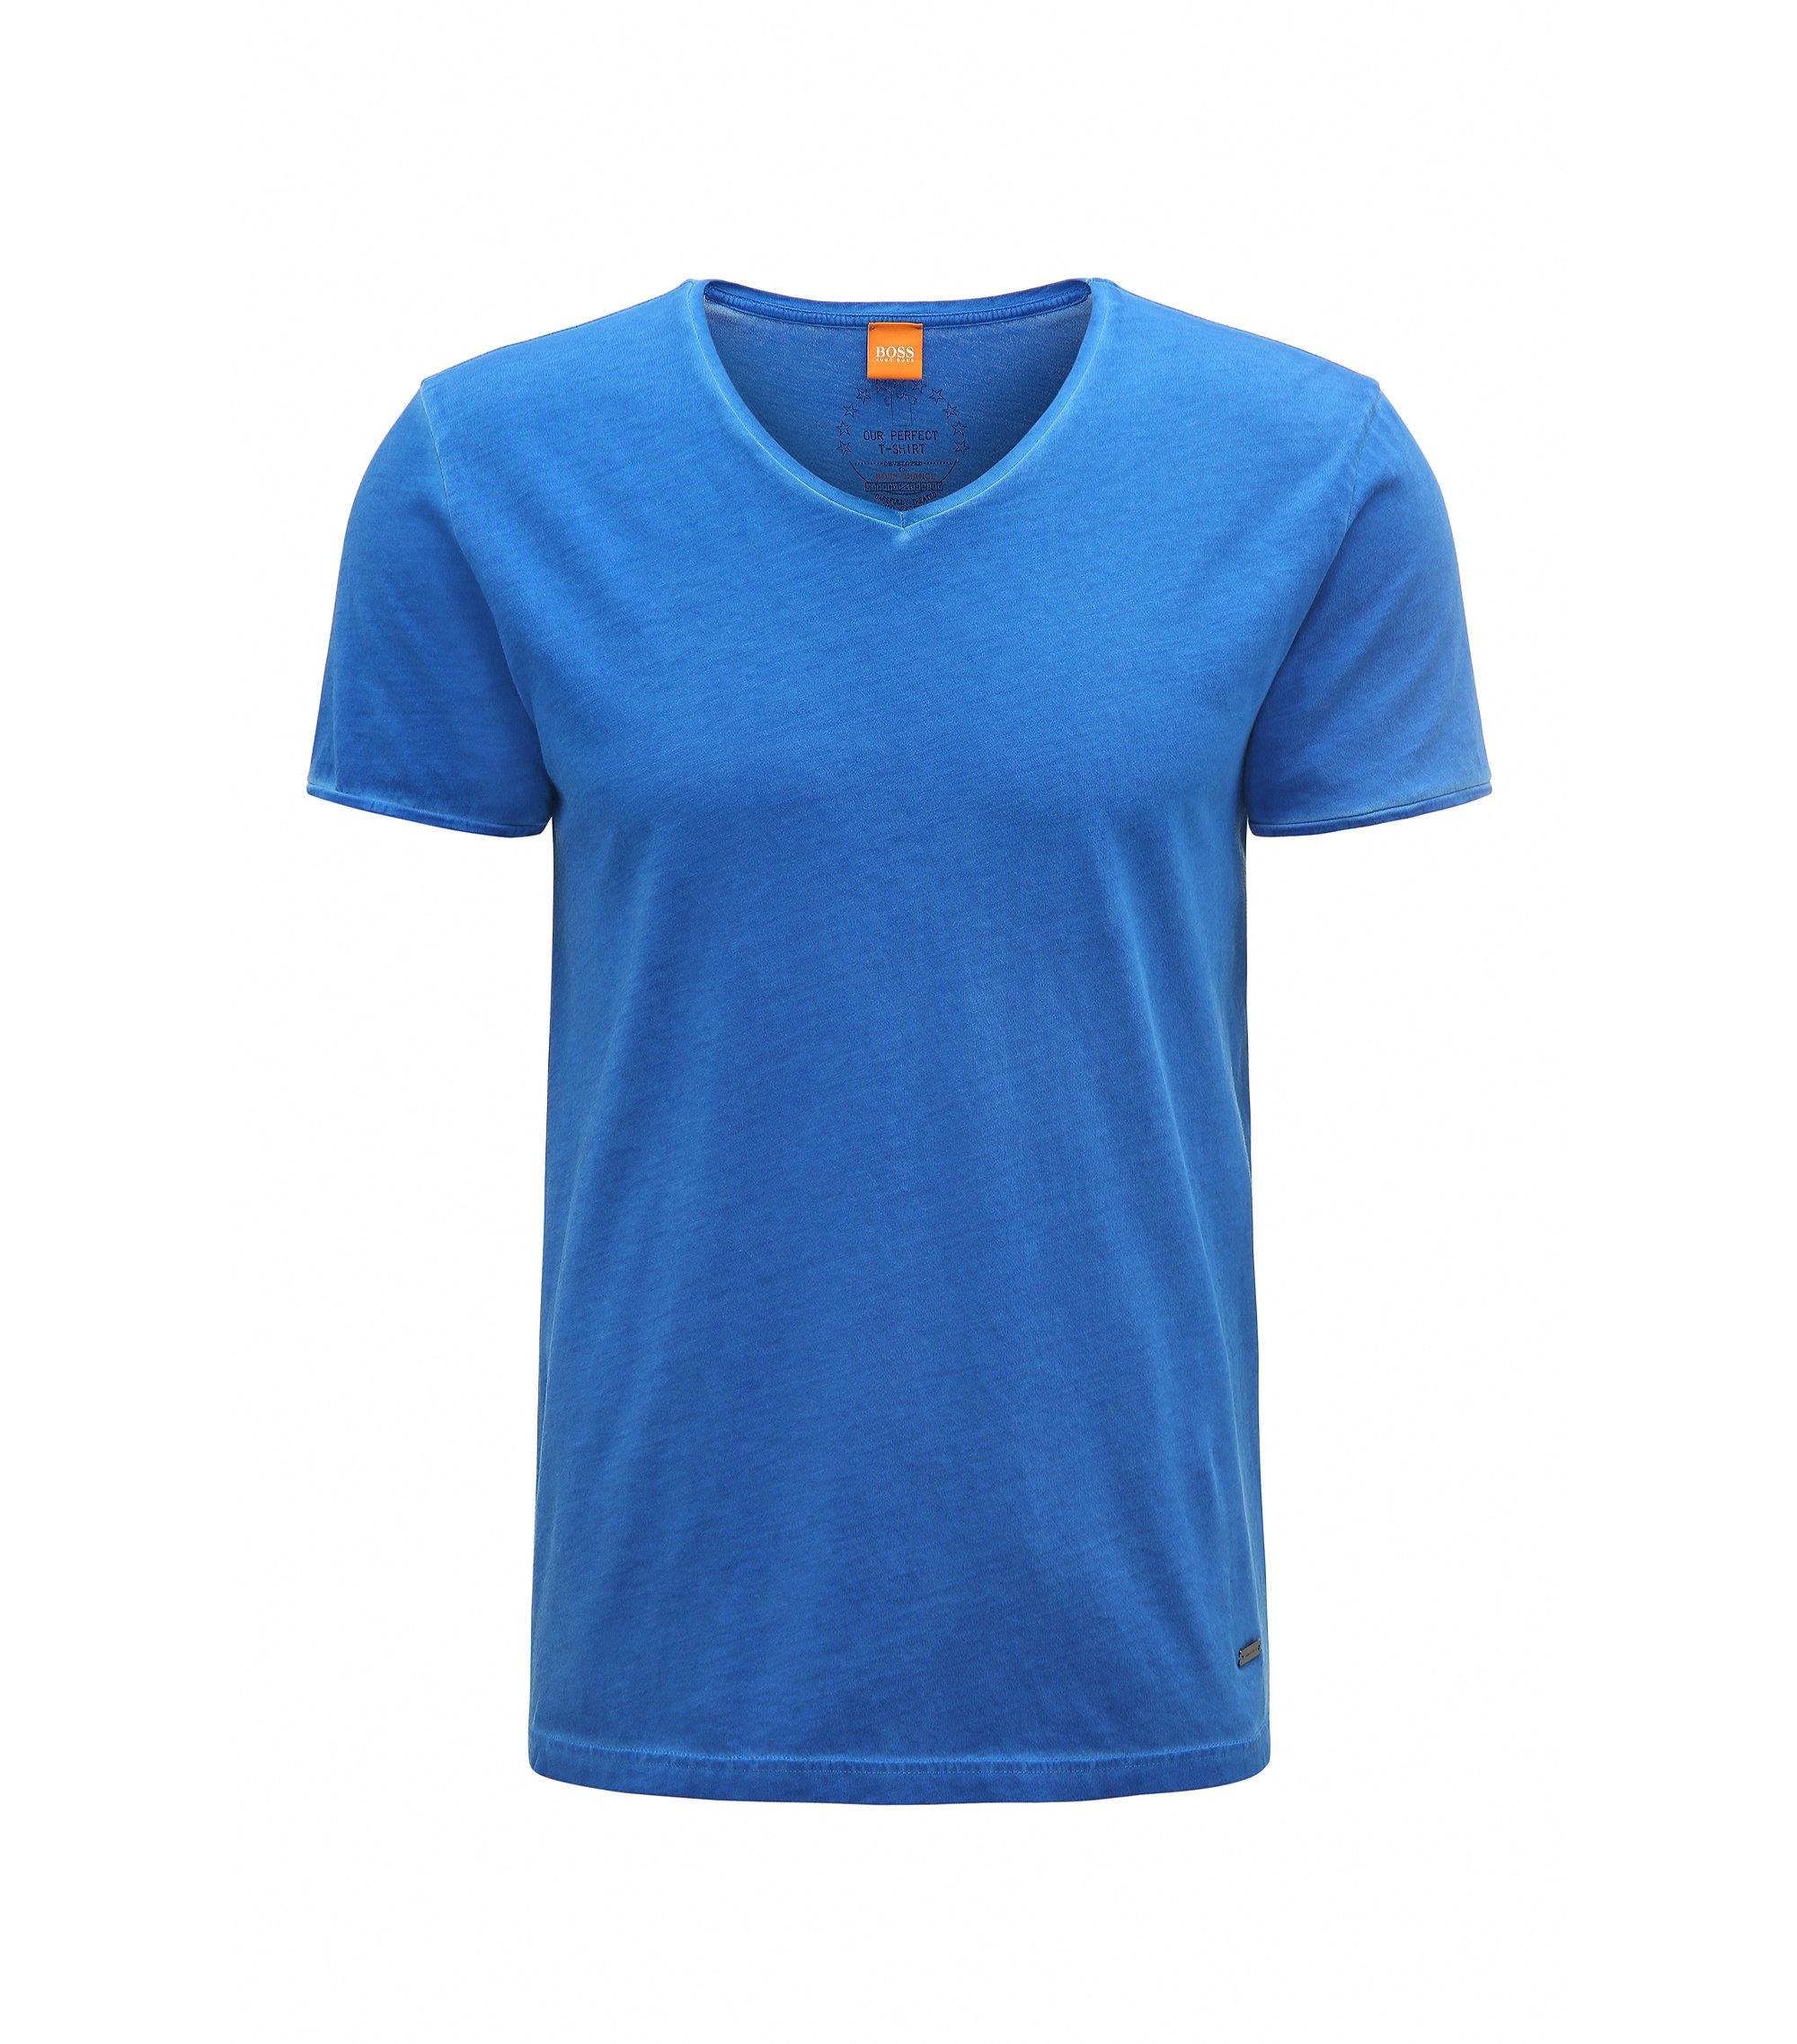 T-shirt regular fit in cotone tinto in capo BOSS Orange, Blue Scuro